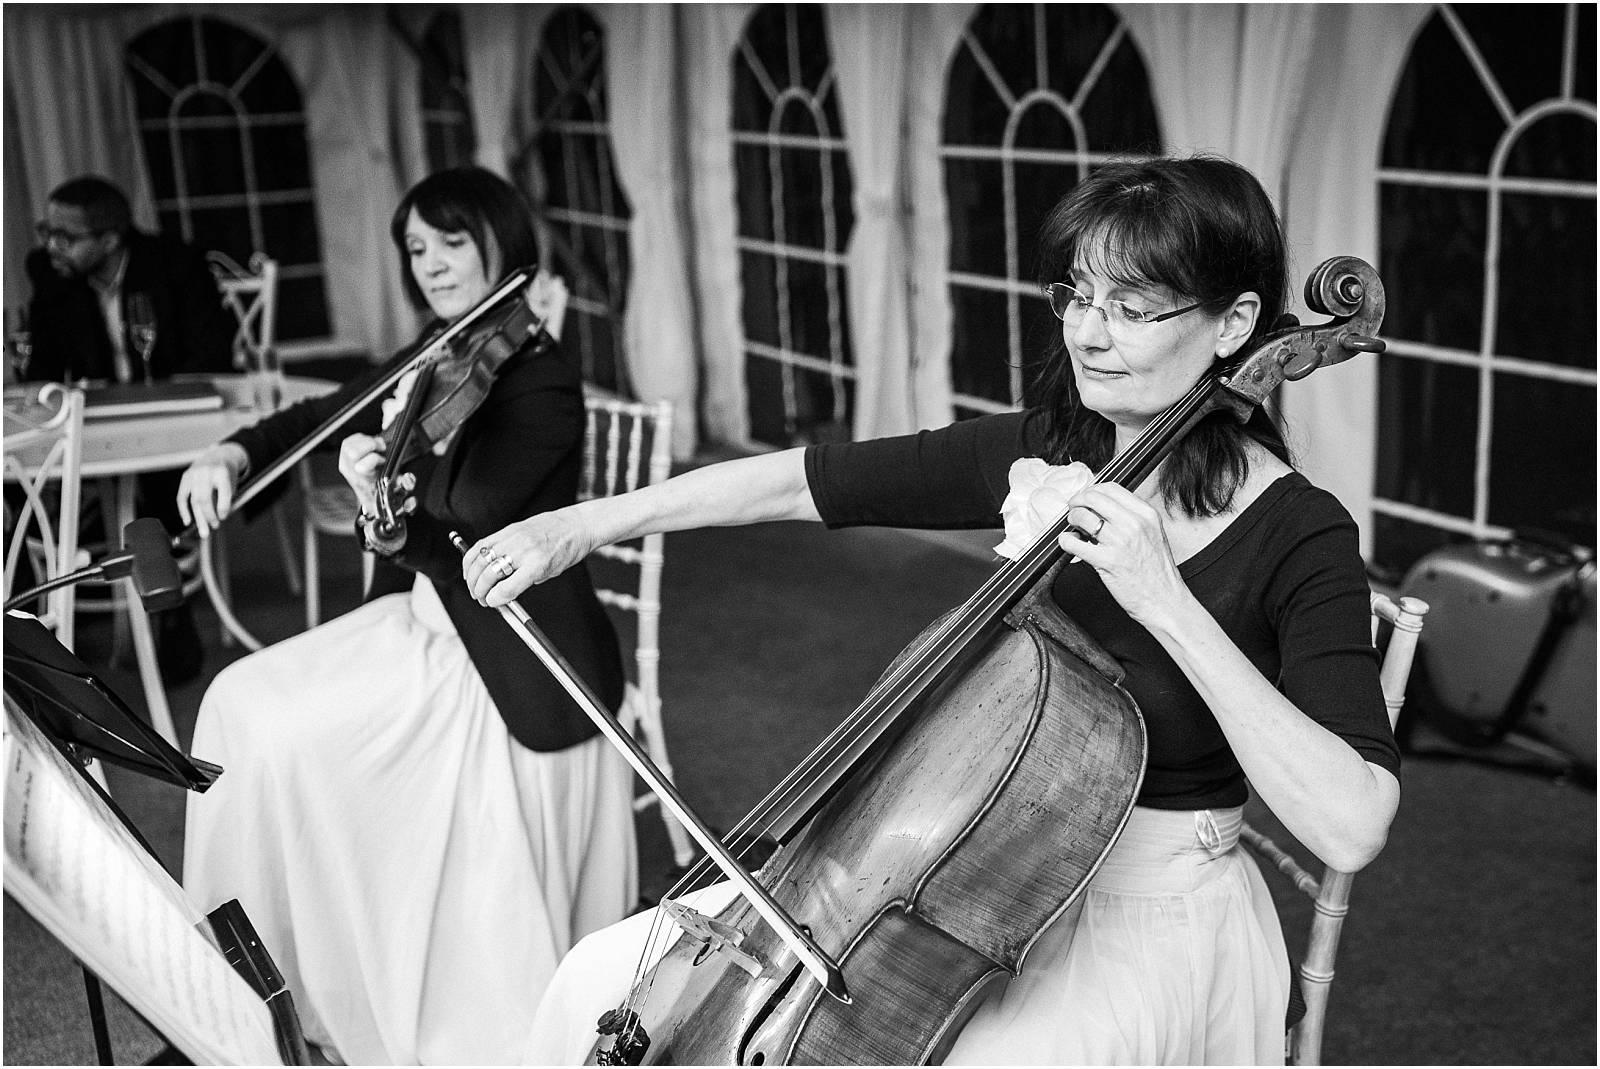 Bow fiddles at micklefield hall kalm kitchen tasting evening